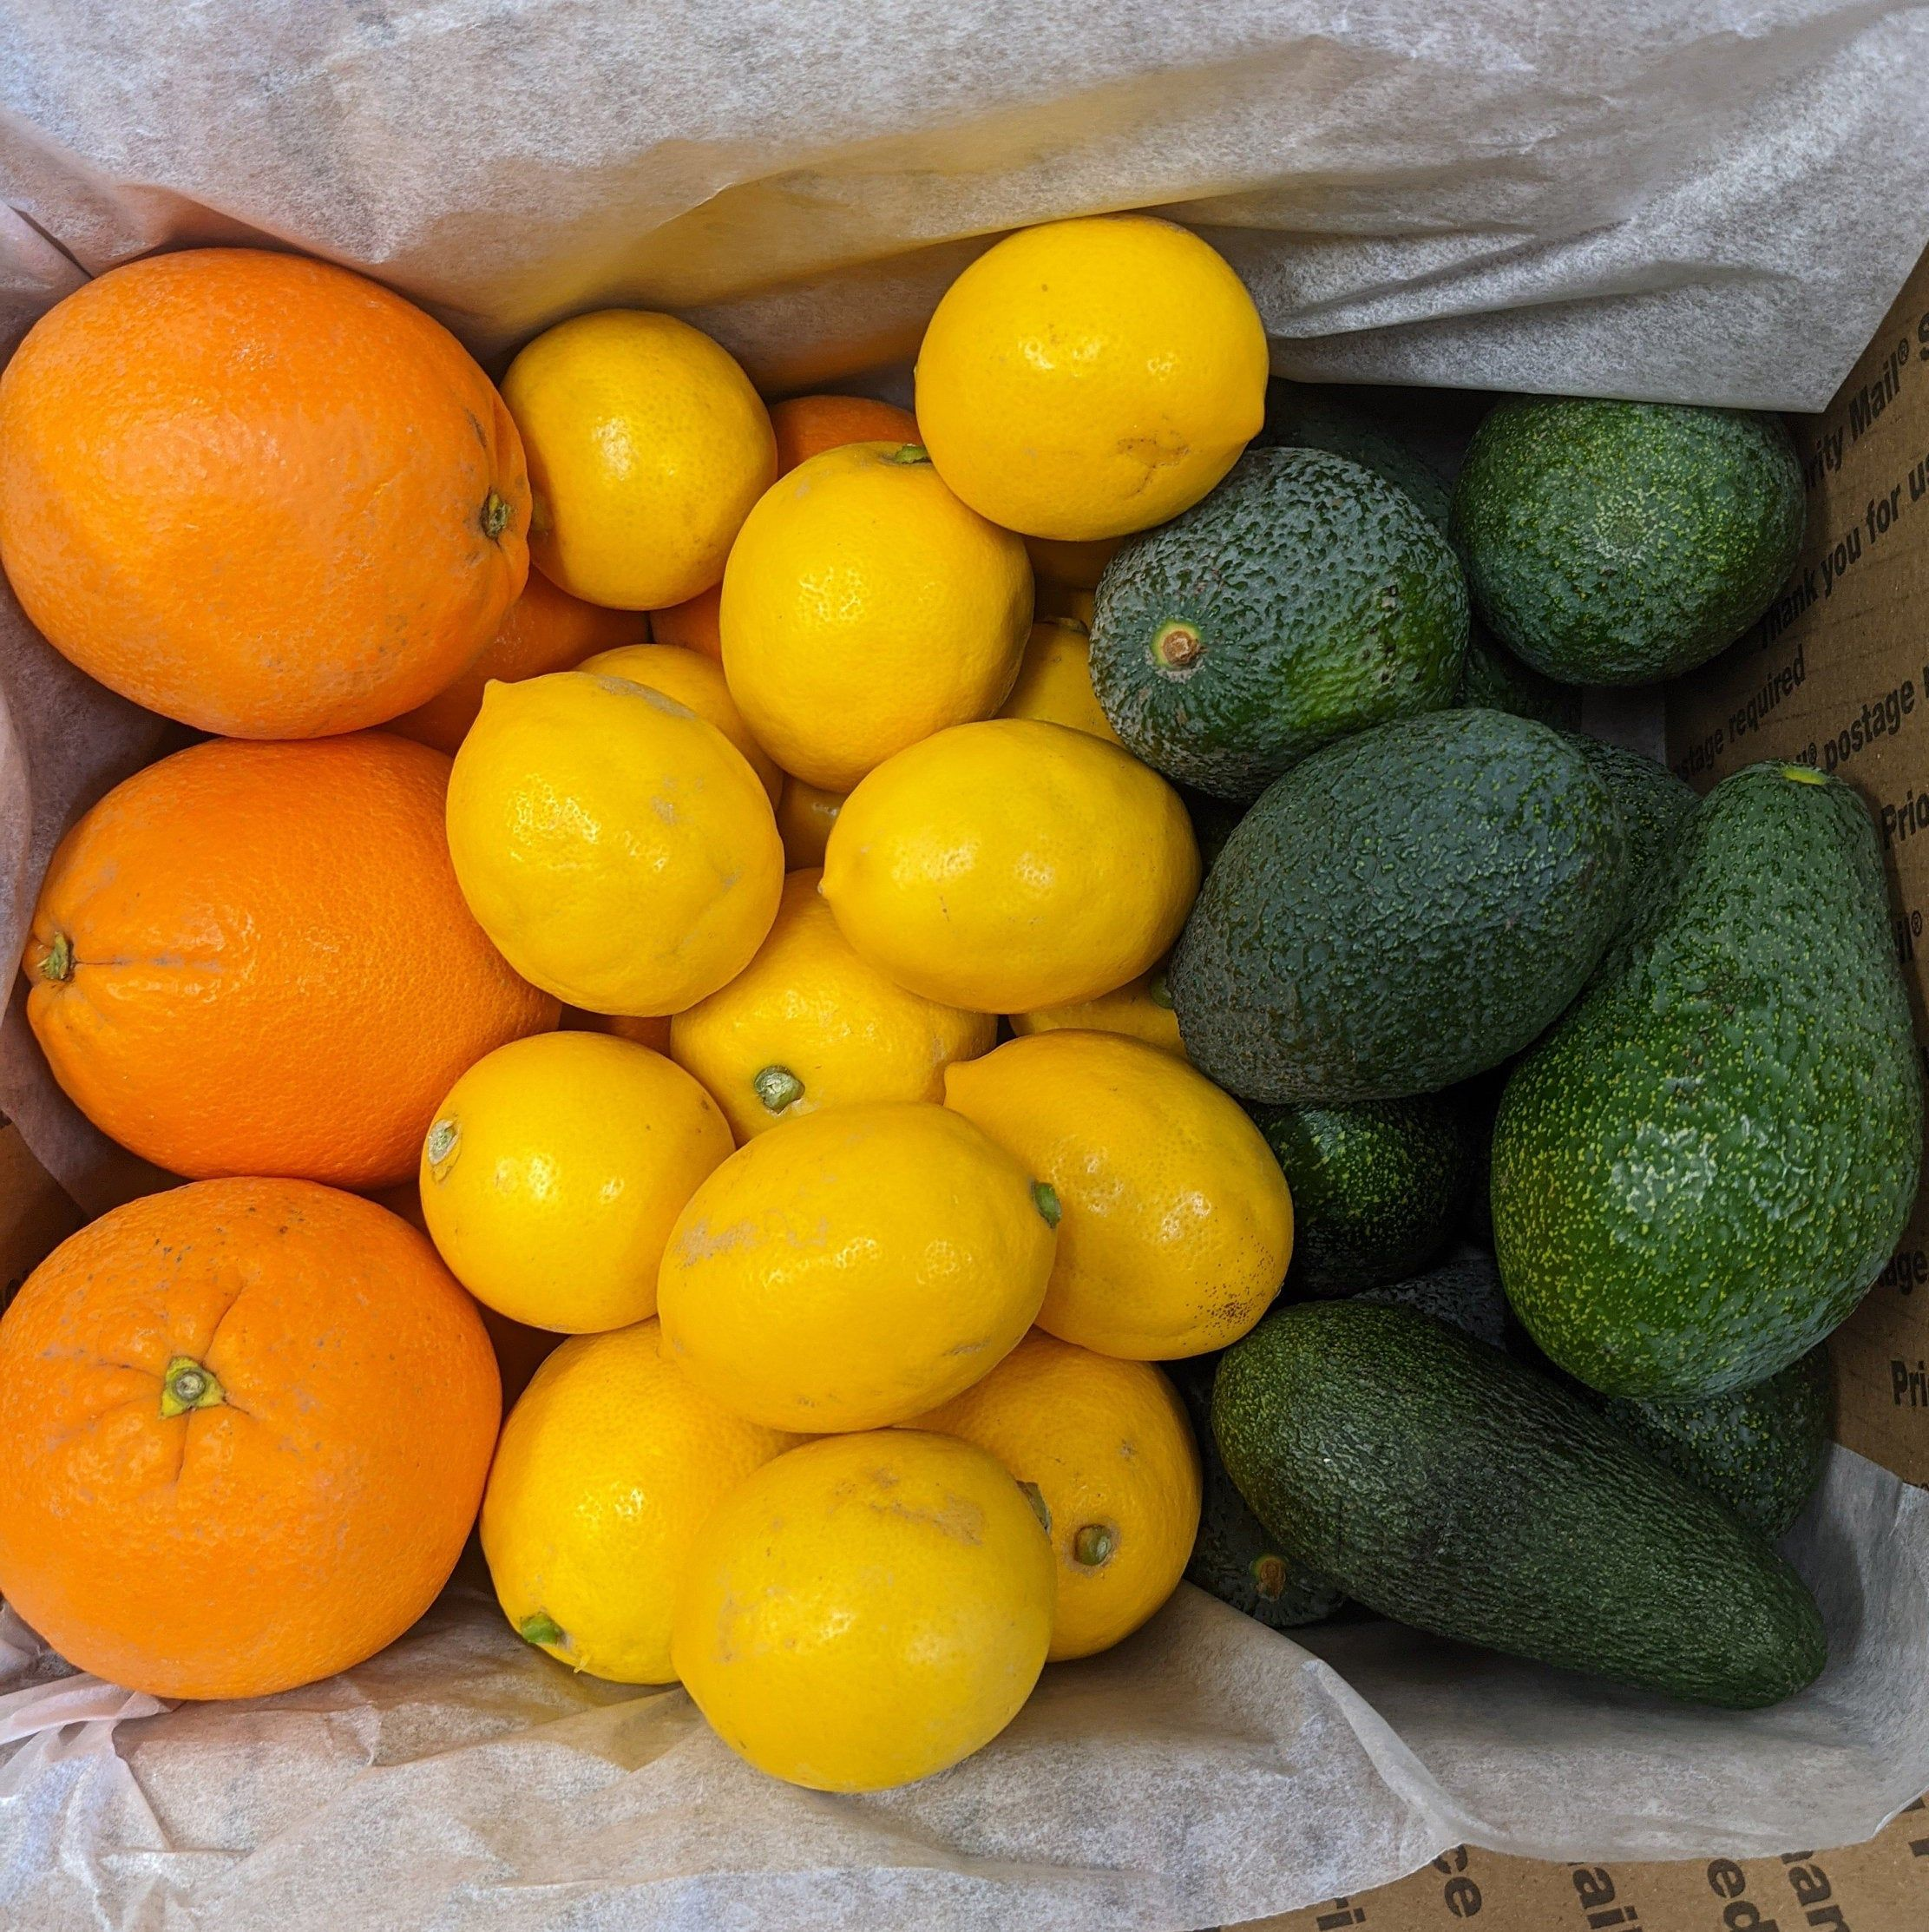 Cara Mia Bella Sale Gift Box 8+lbs Cara Cara Pink Navels Tangerines Lemons Healthy Delivered Fresh